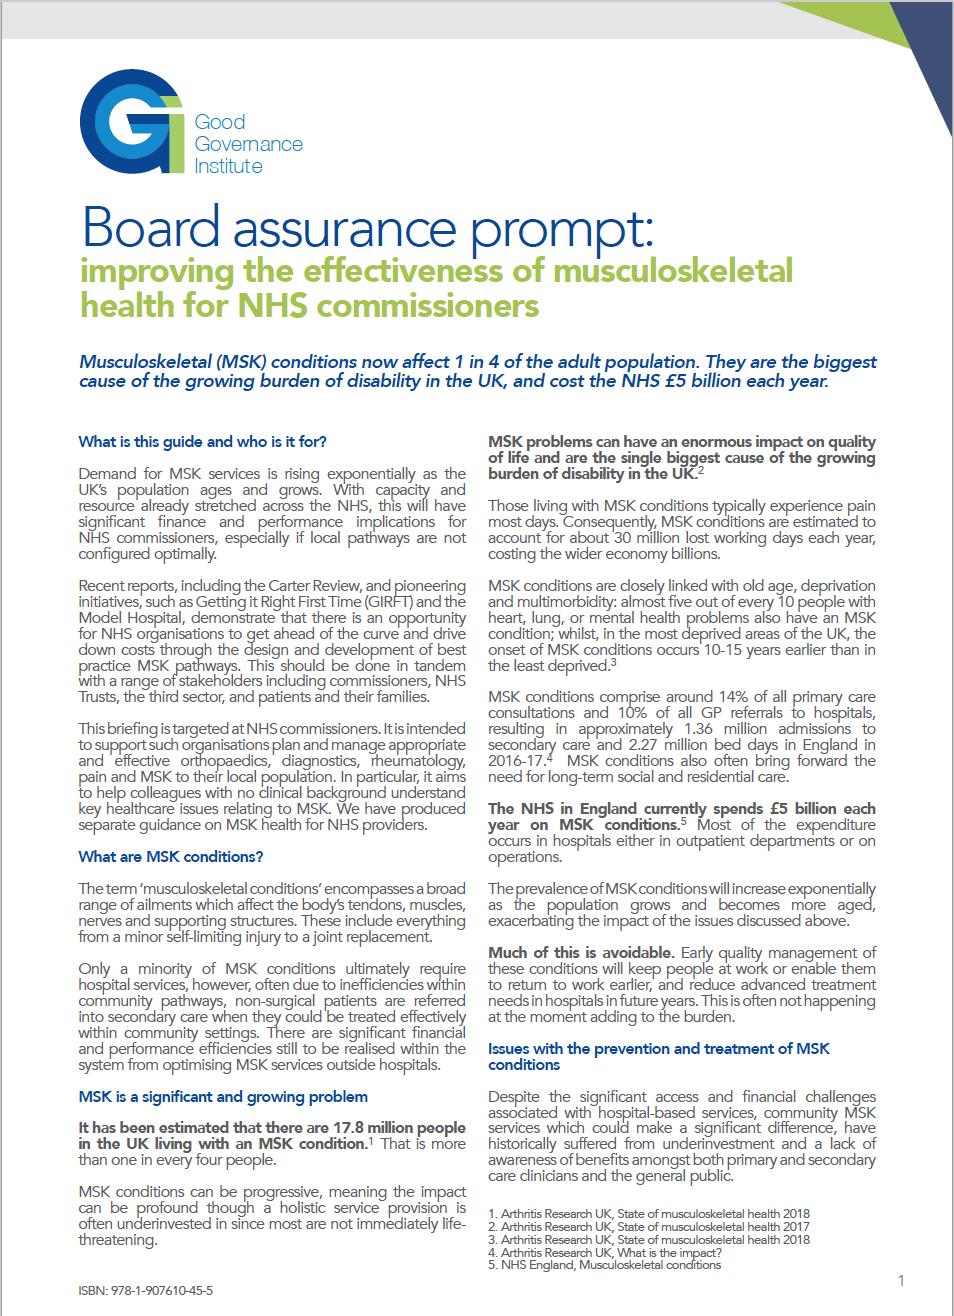 Board assurance prompt - MSK for NHS Commissioners